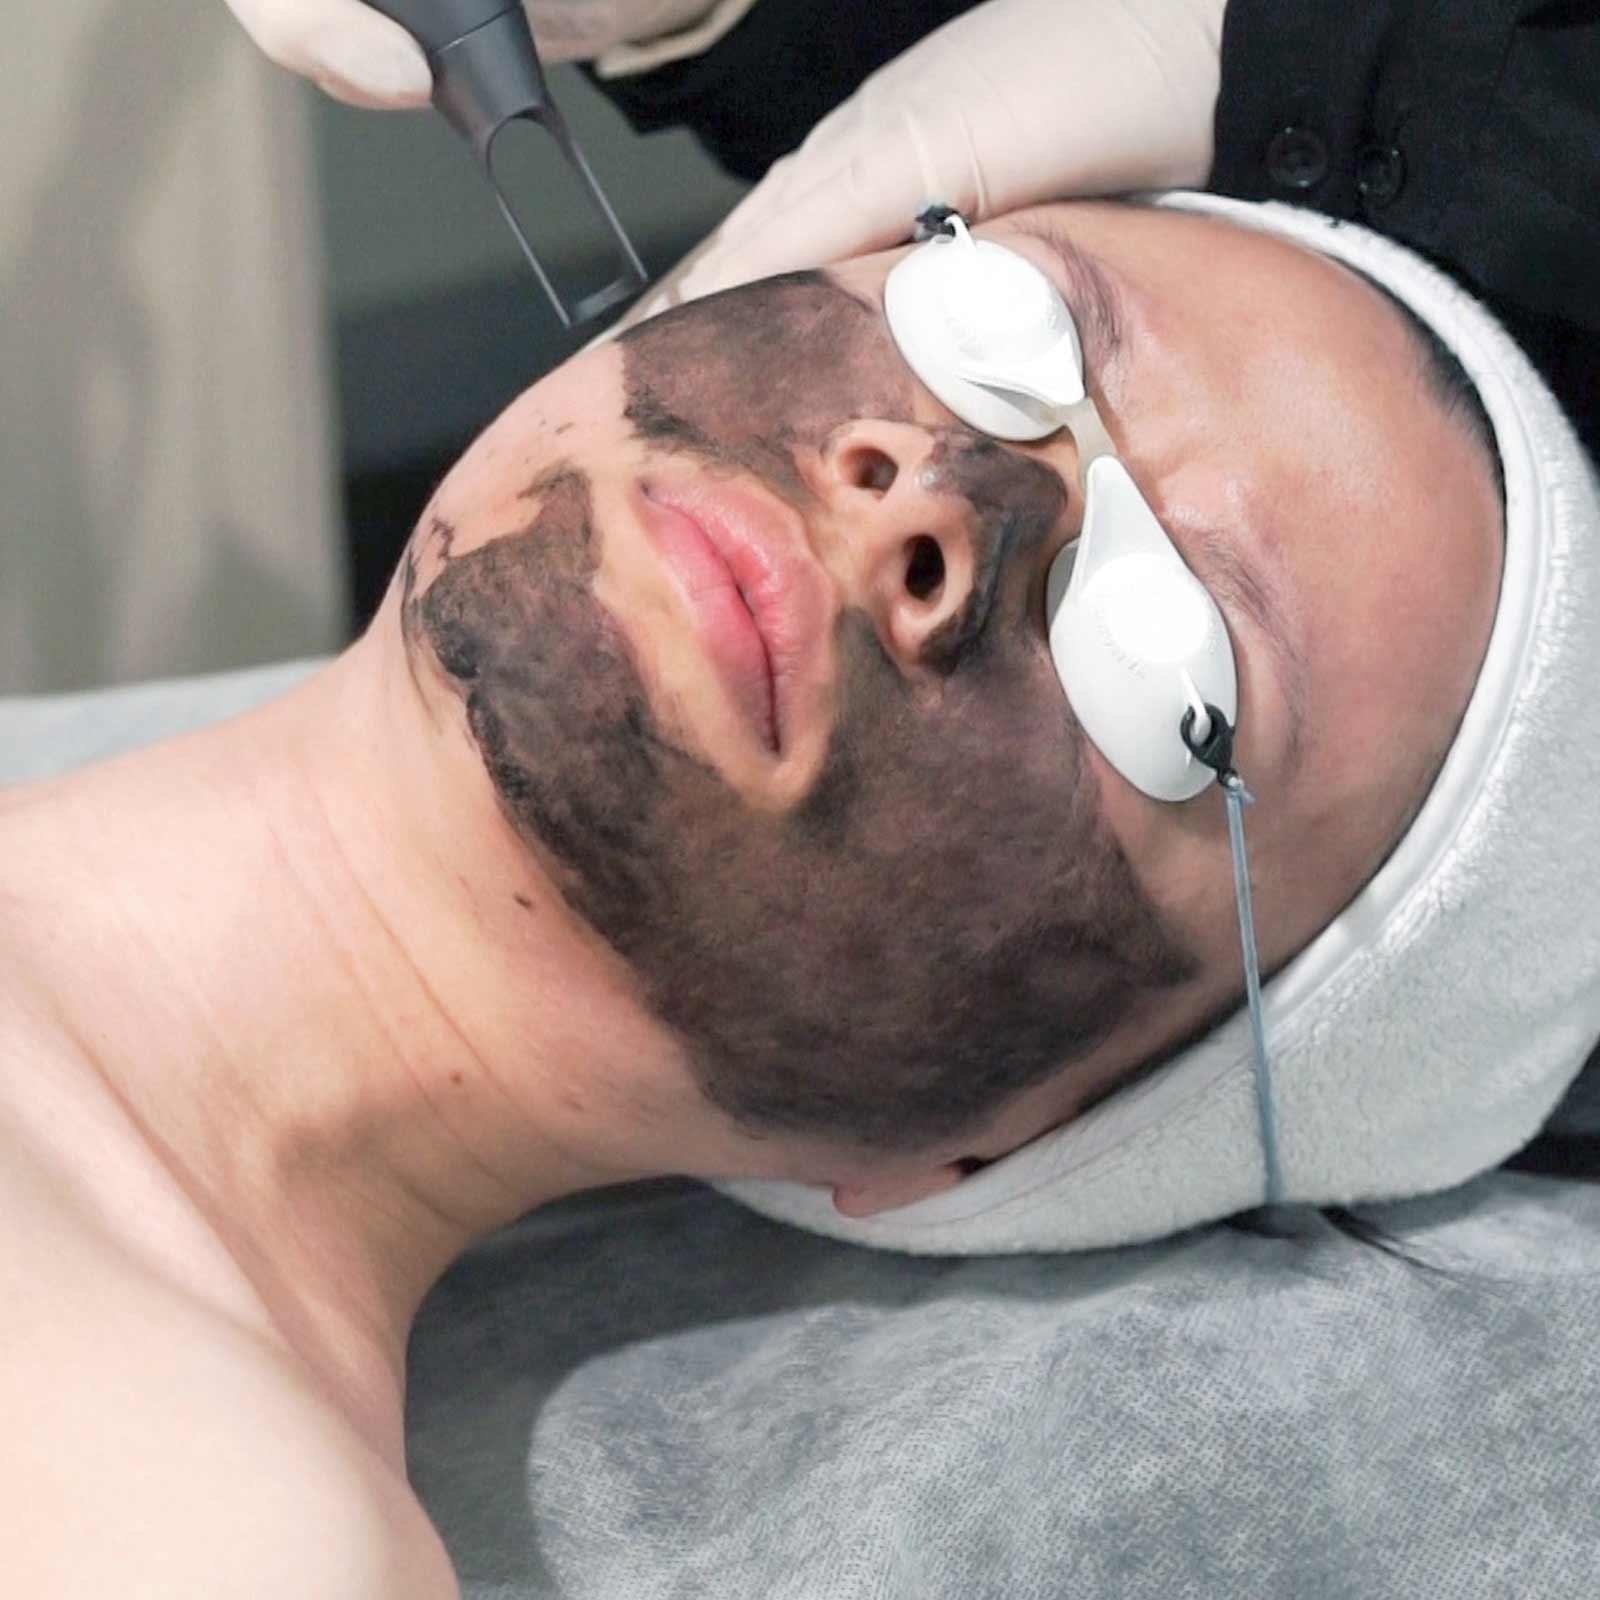 lorna jane china doll rejuvenation laser treatment1